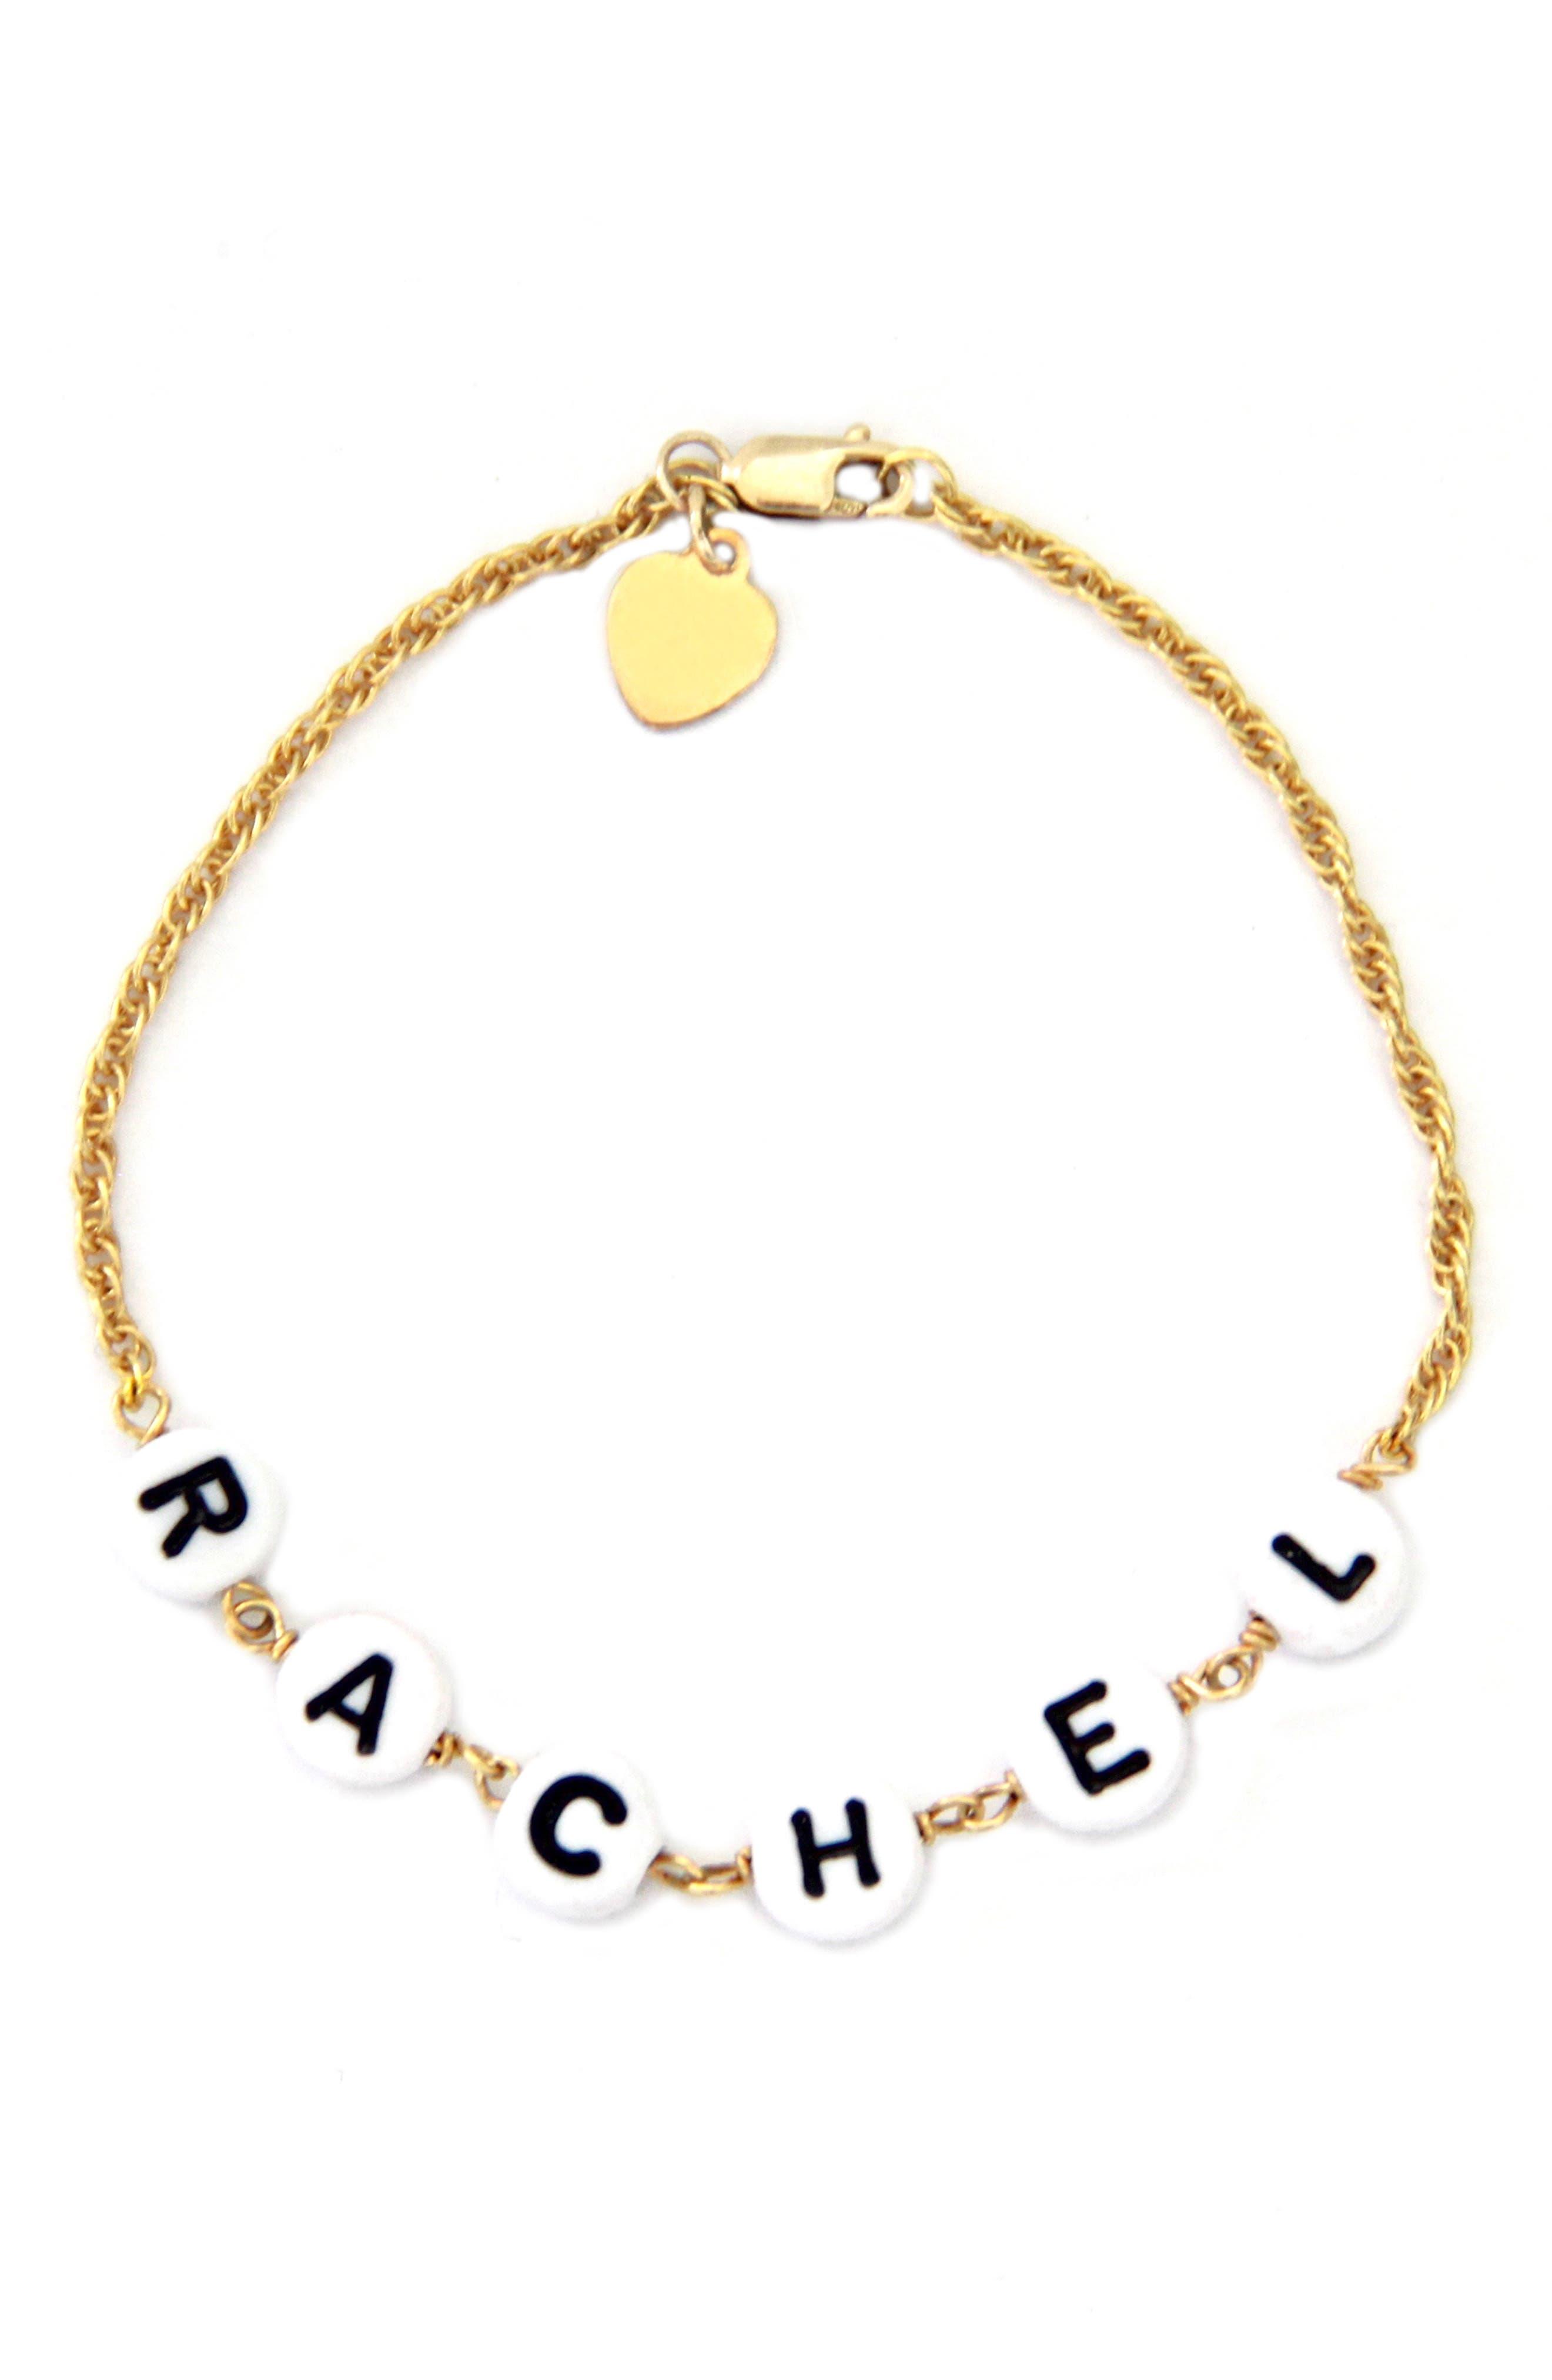 Beaded Baby Name Bracelet